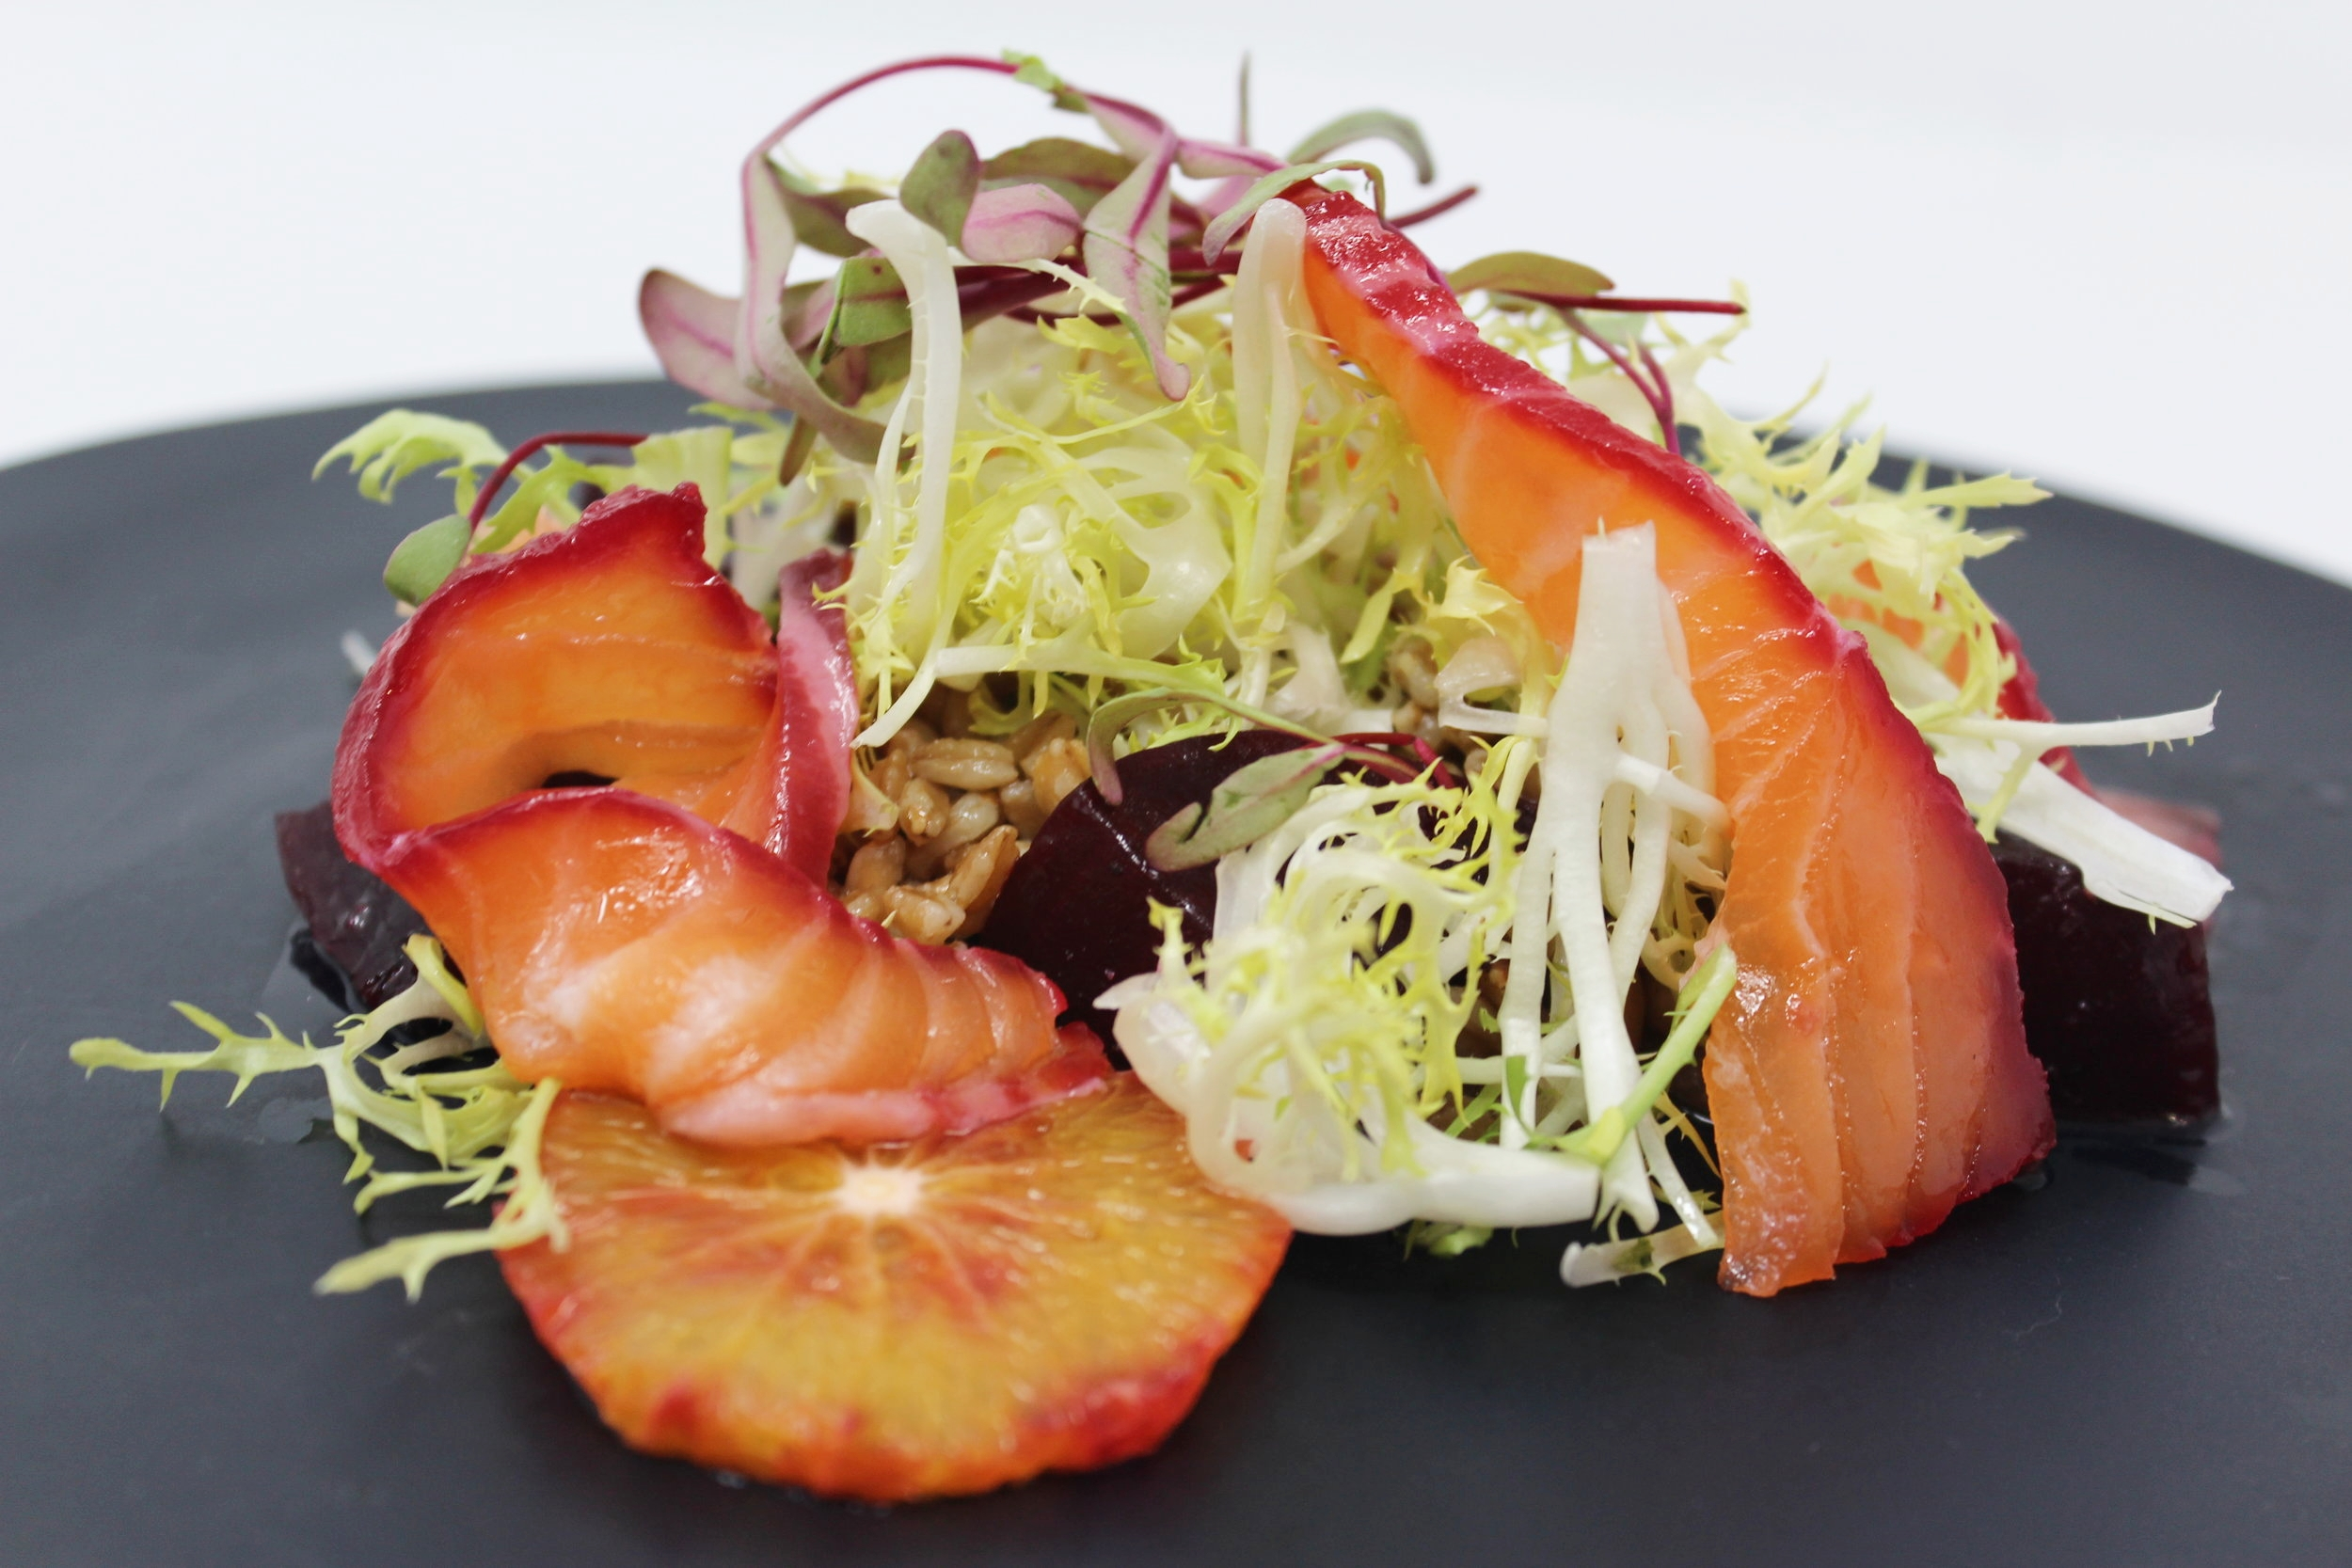 Ziegfeld Ballroom's Beet Cured Salmon.